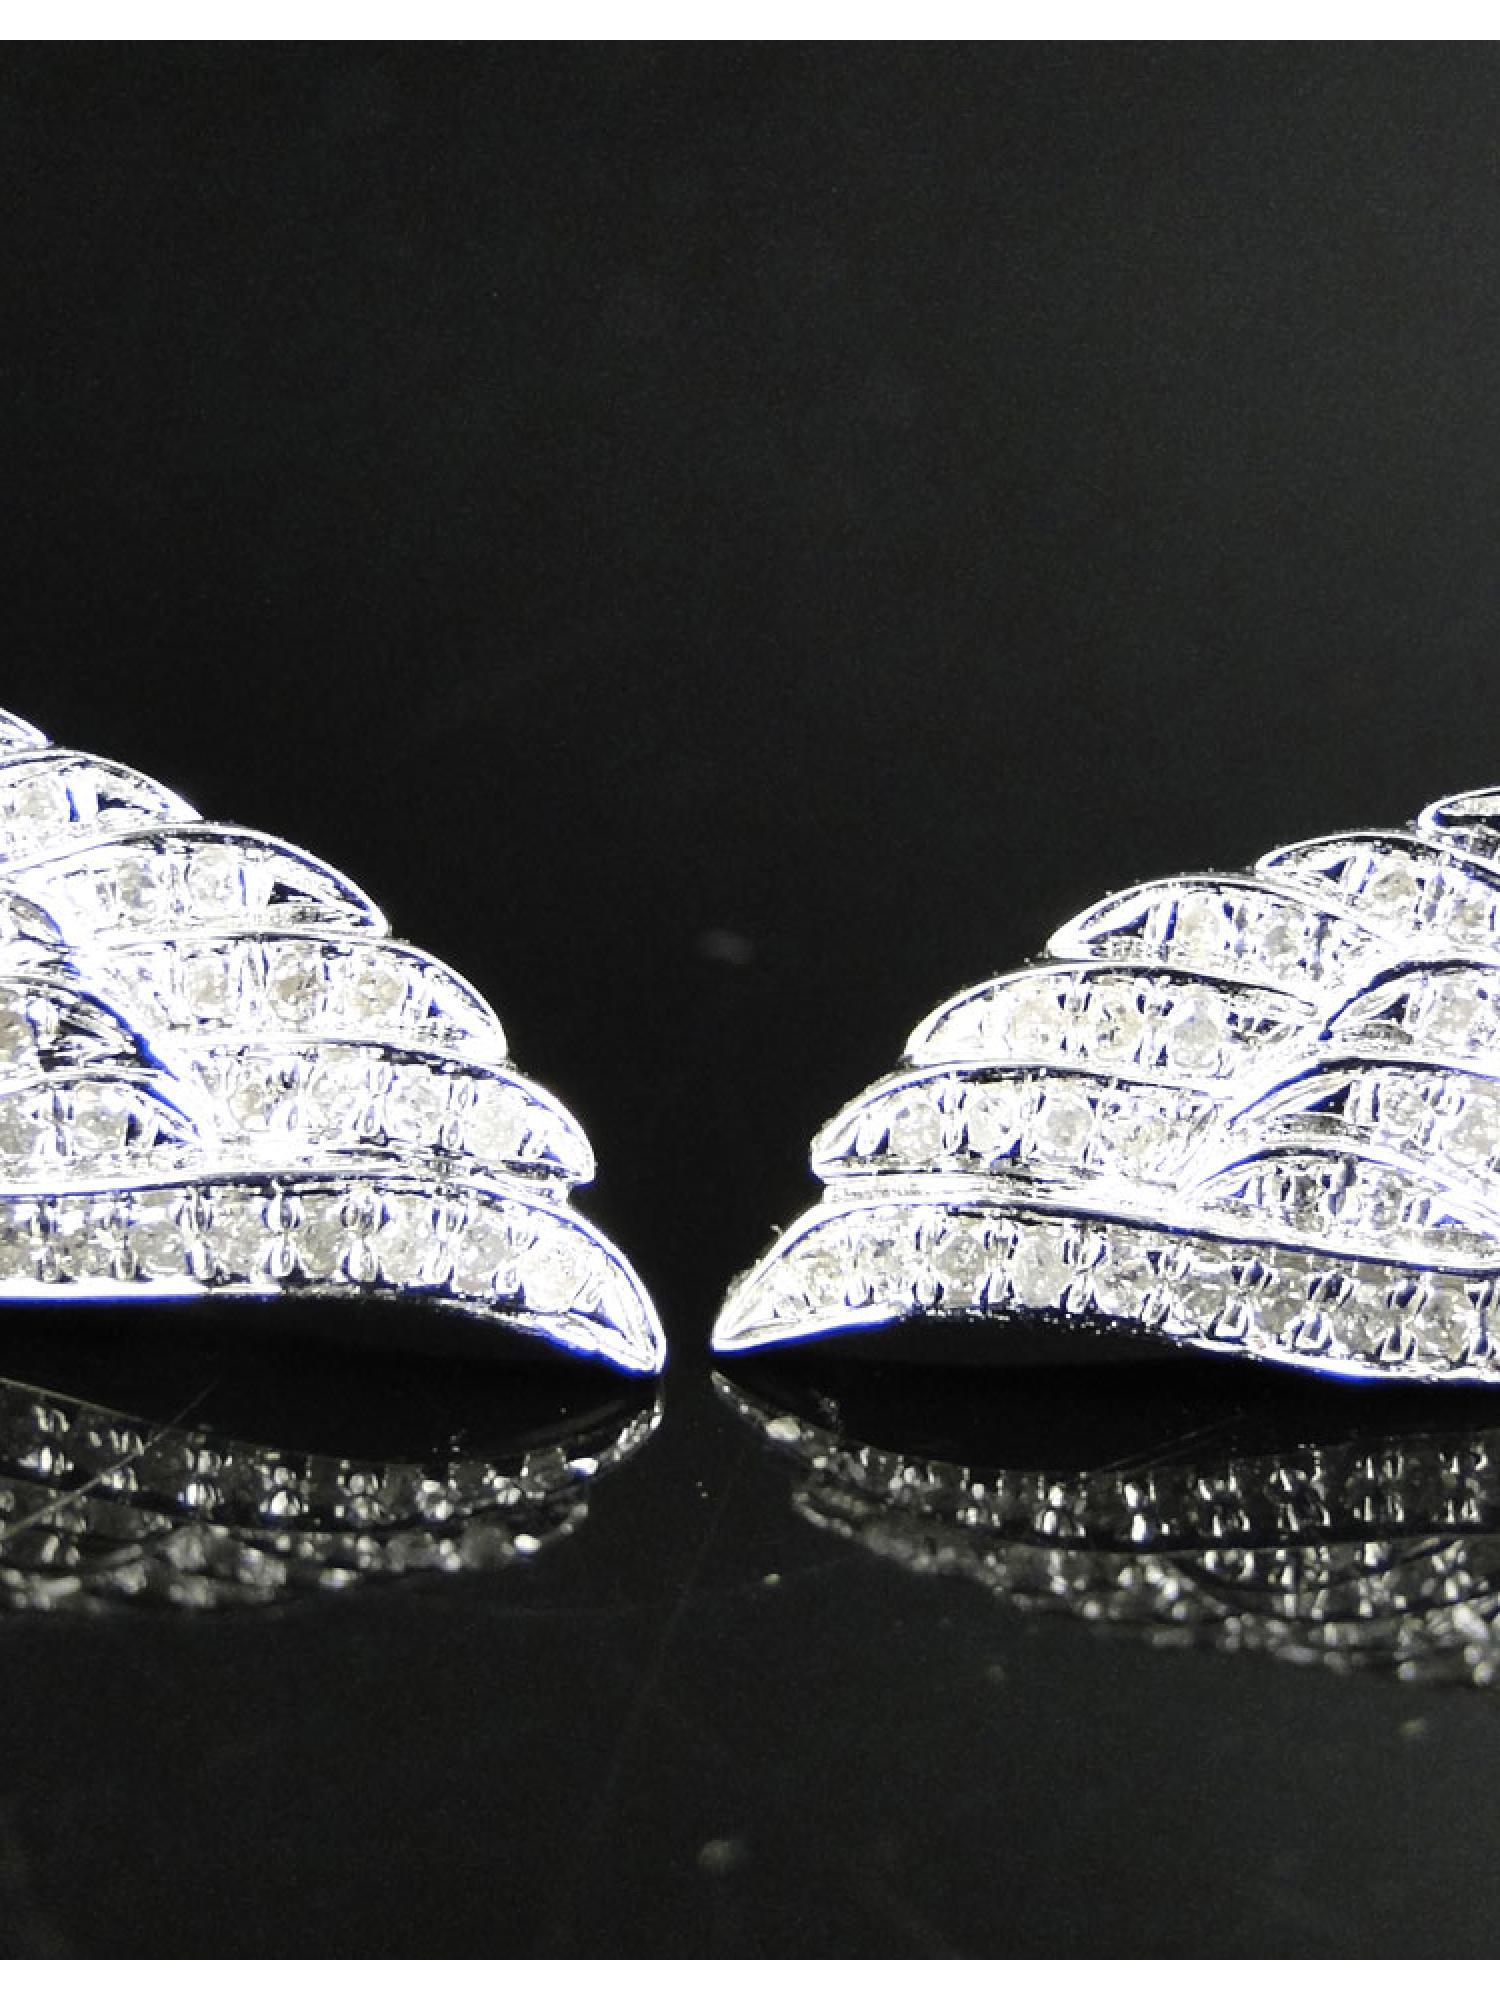 Angel Wing Stud Earrings set in 14k White Gold (0.50 Ct)